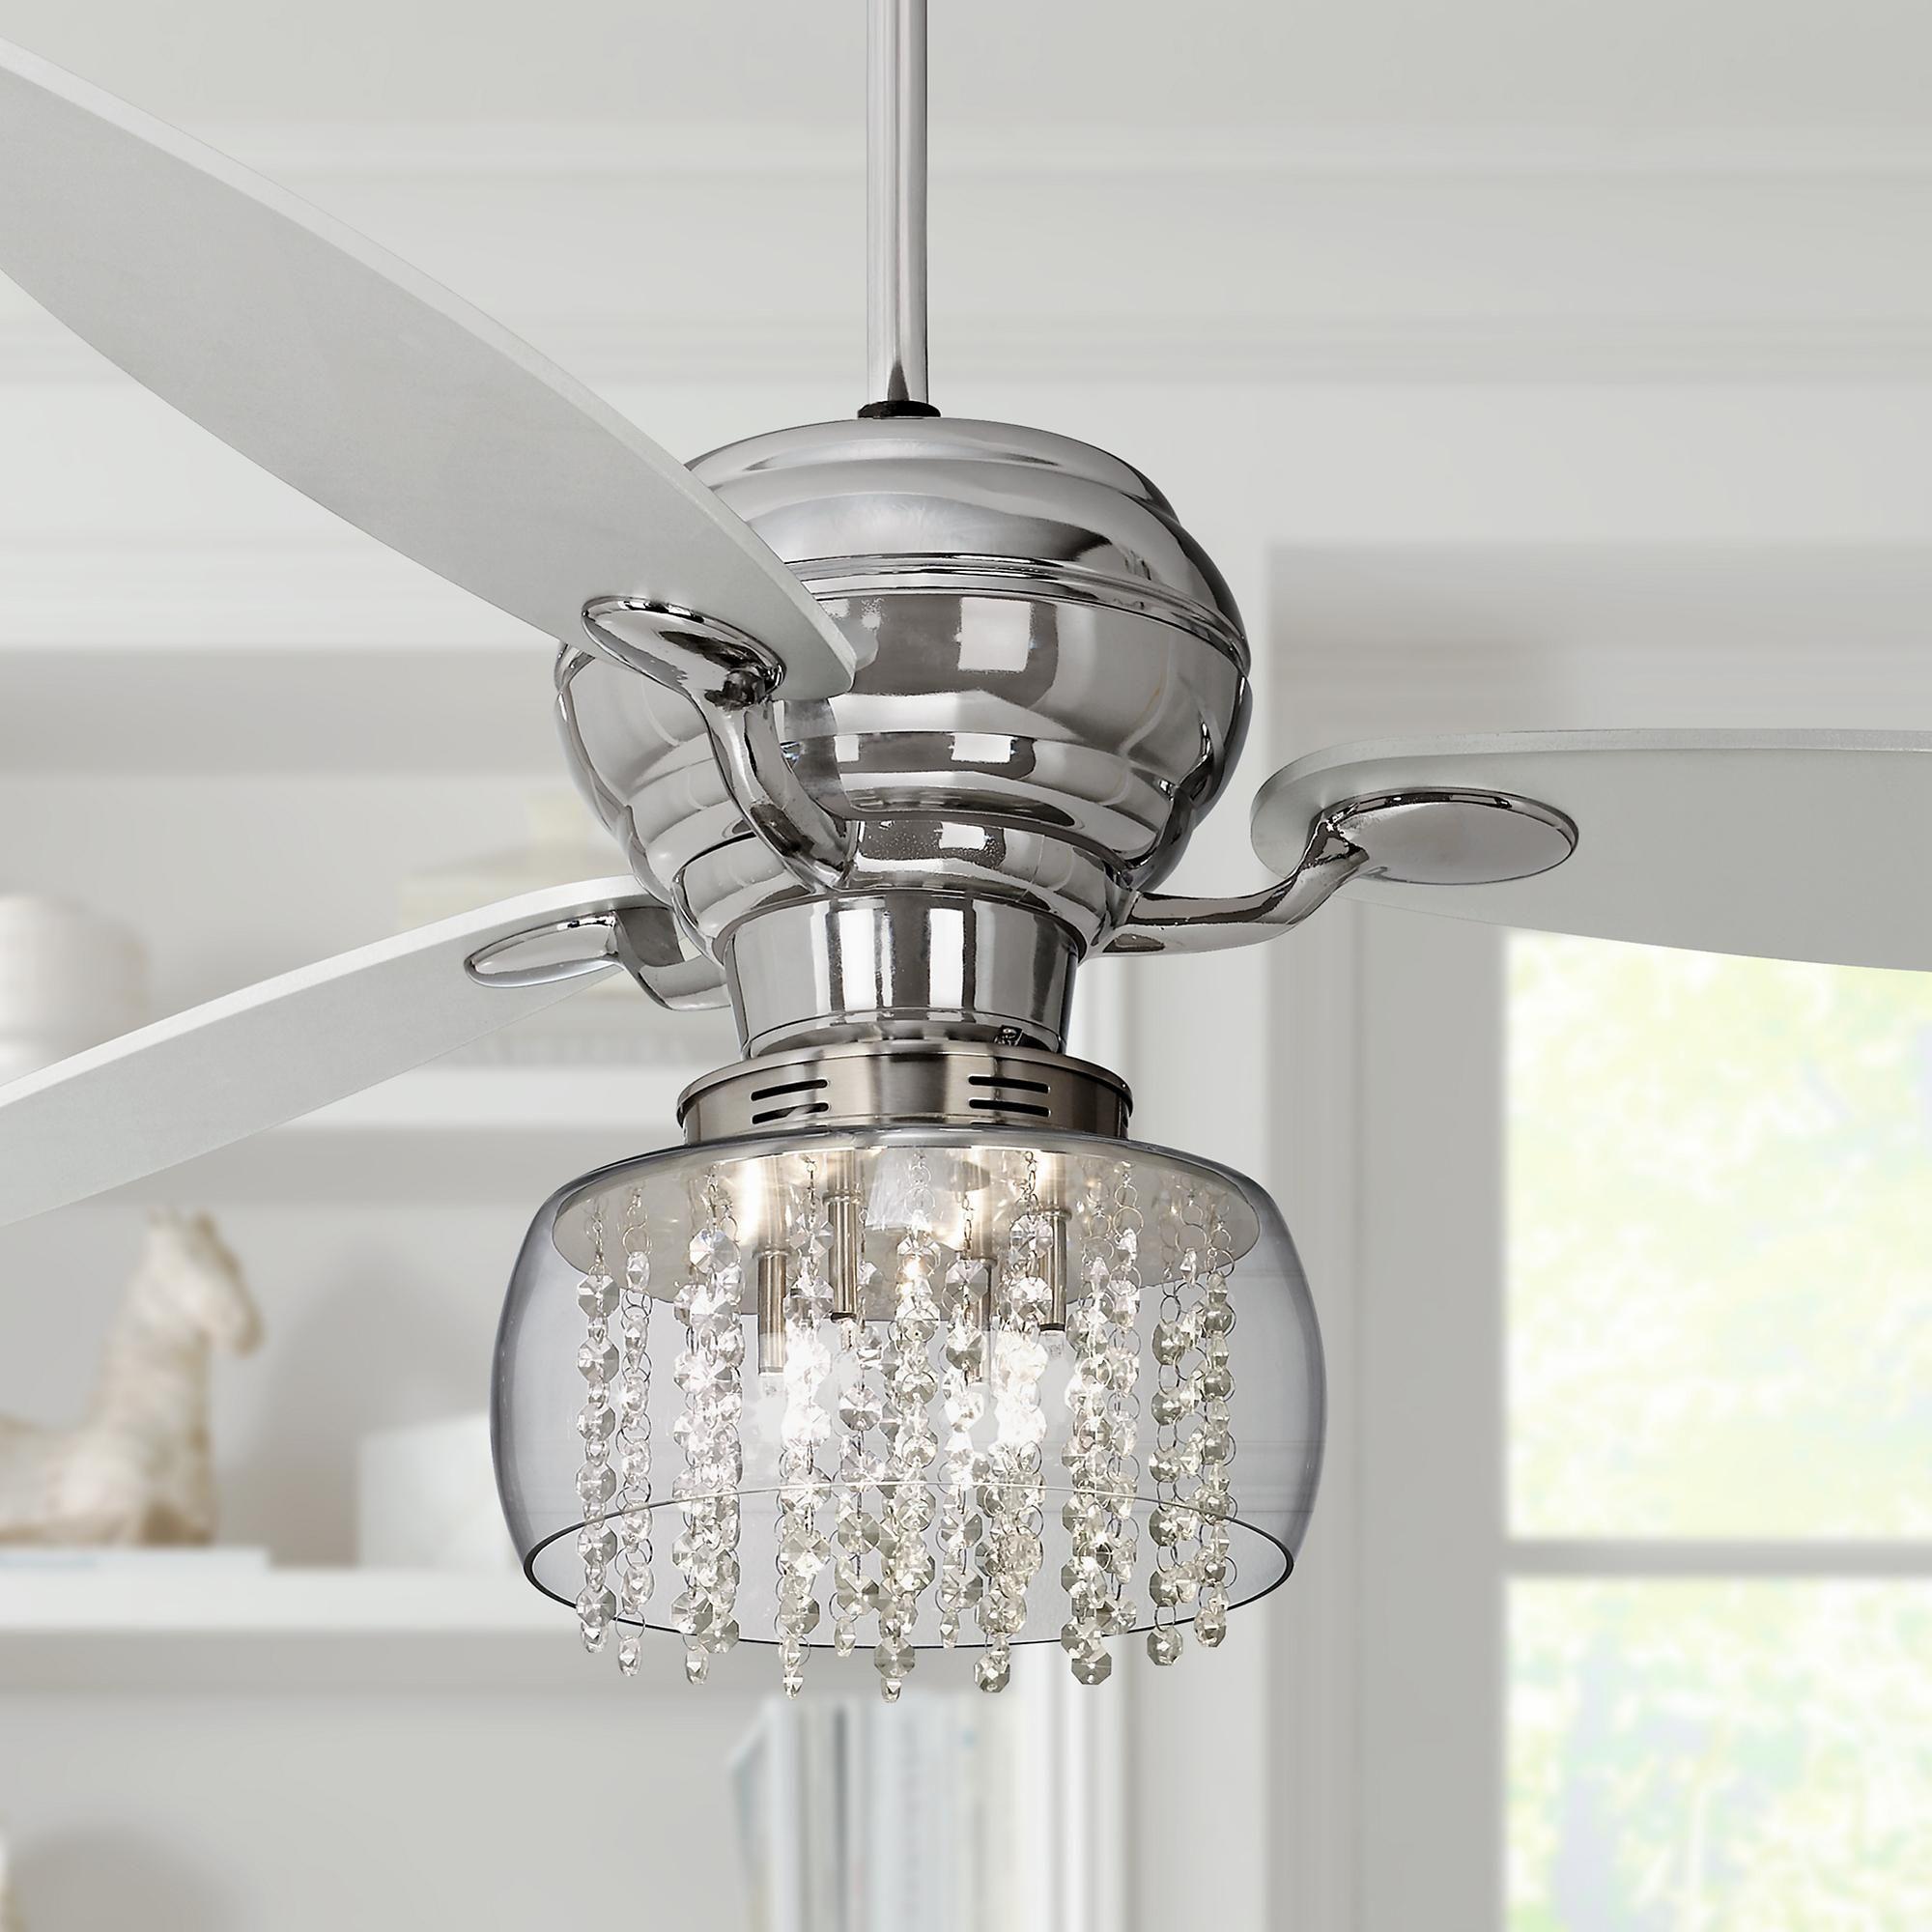 60 Inch Spyder Chrome Crystal Rainfall Led Ceiling Fan In 2020 Chrome Ceiling Fan Bedroom Ceiling Light Ceiling Fan